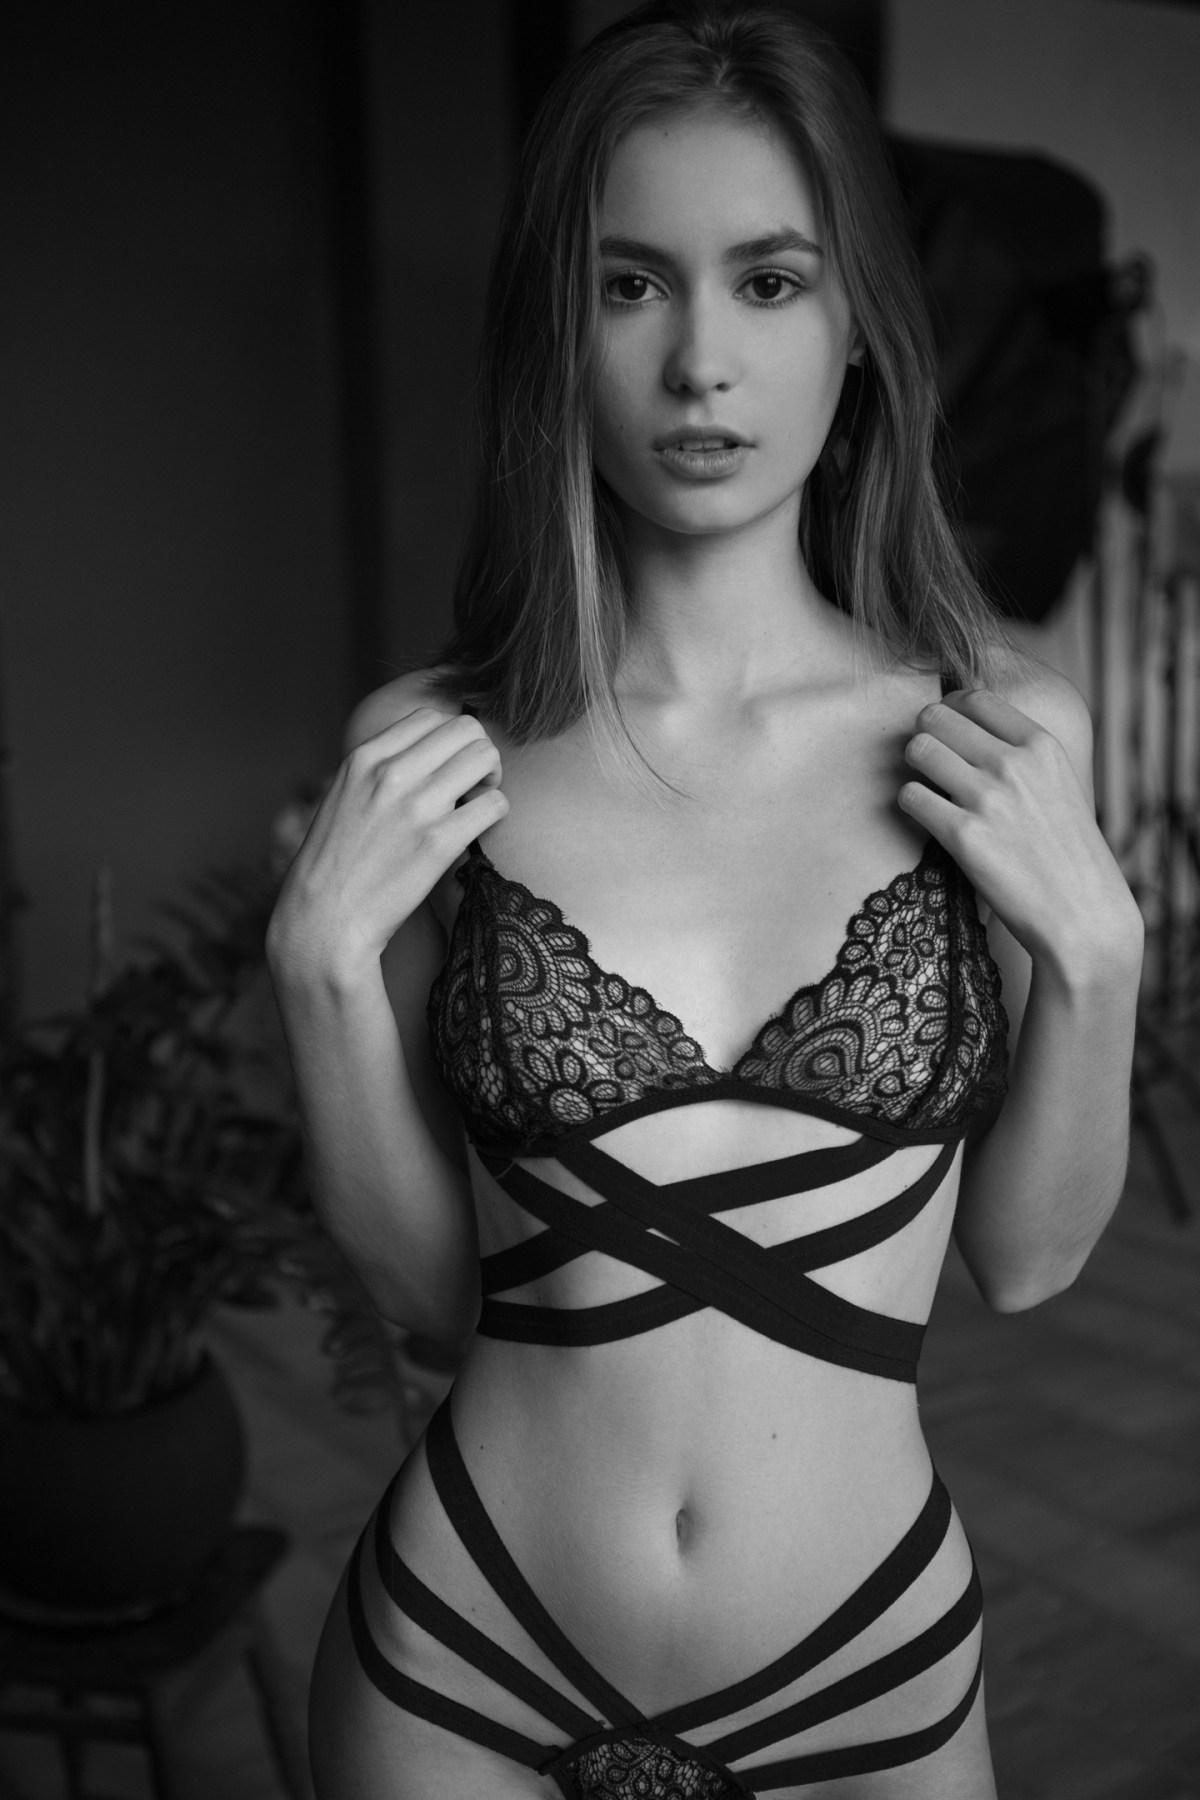 Katya by Alex Nemalevich